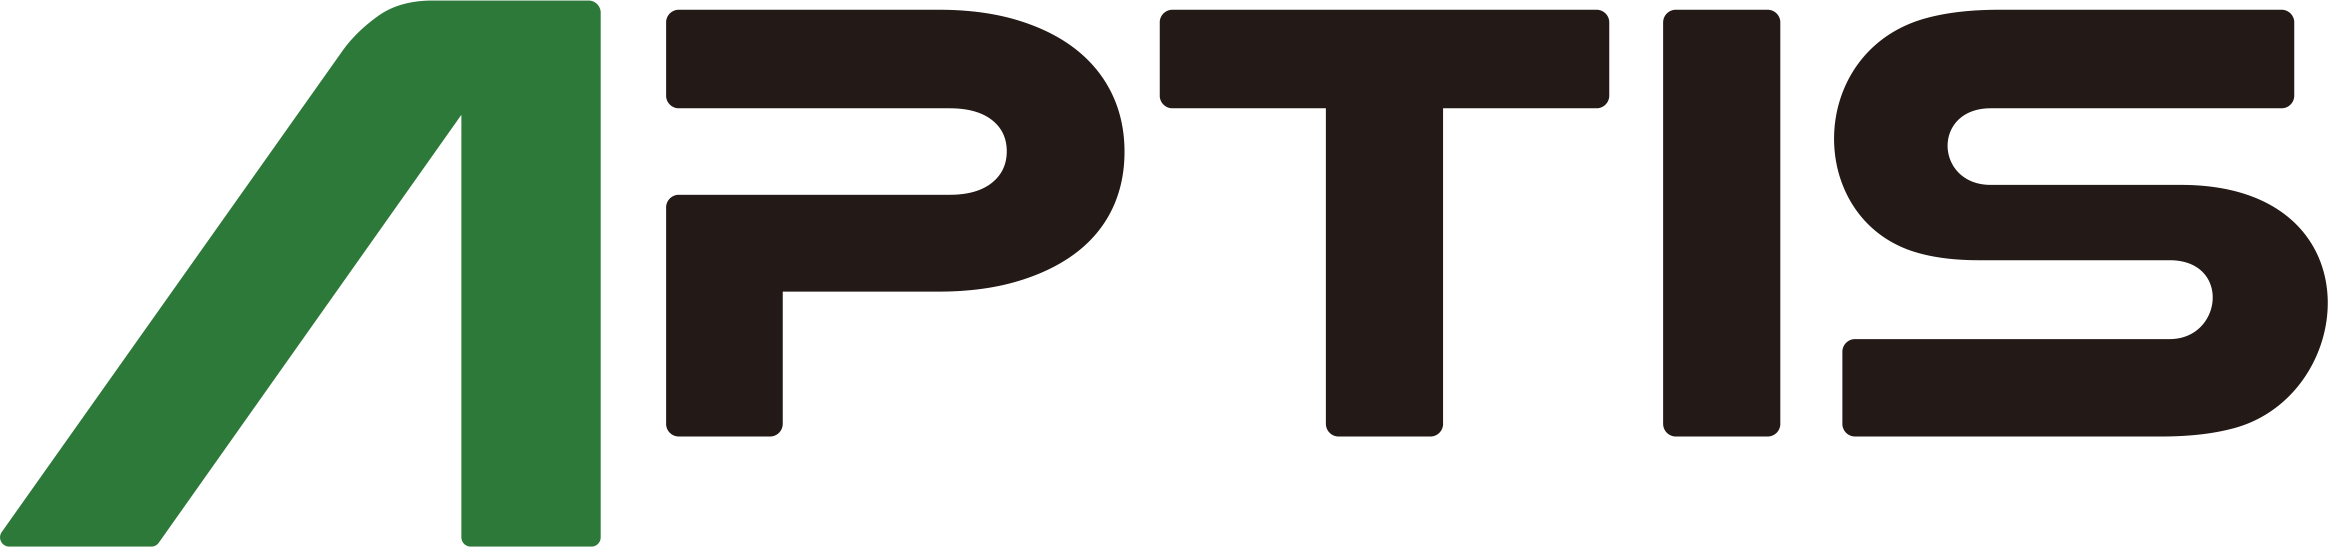 Company logo of Aptis